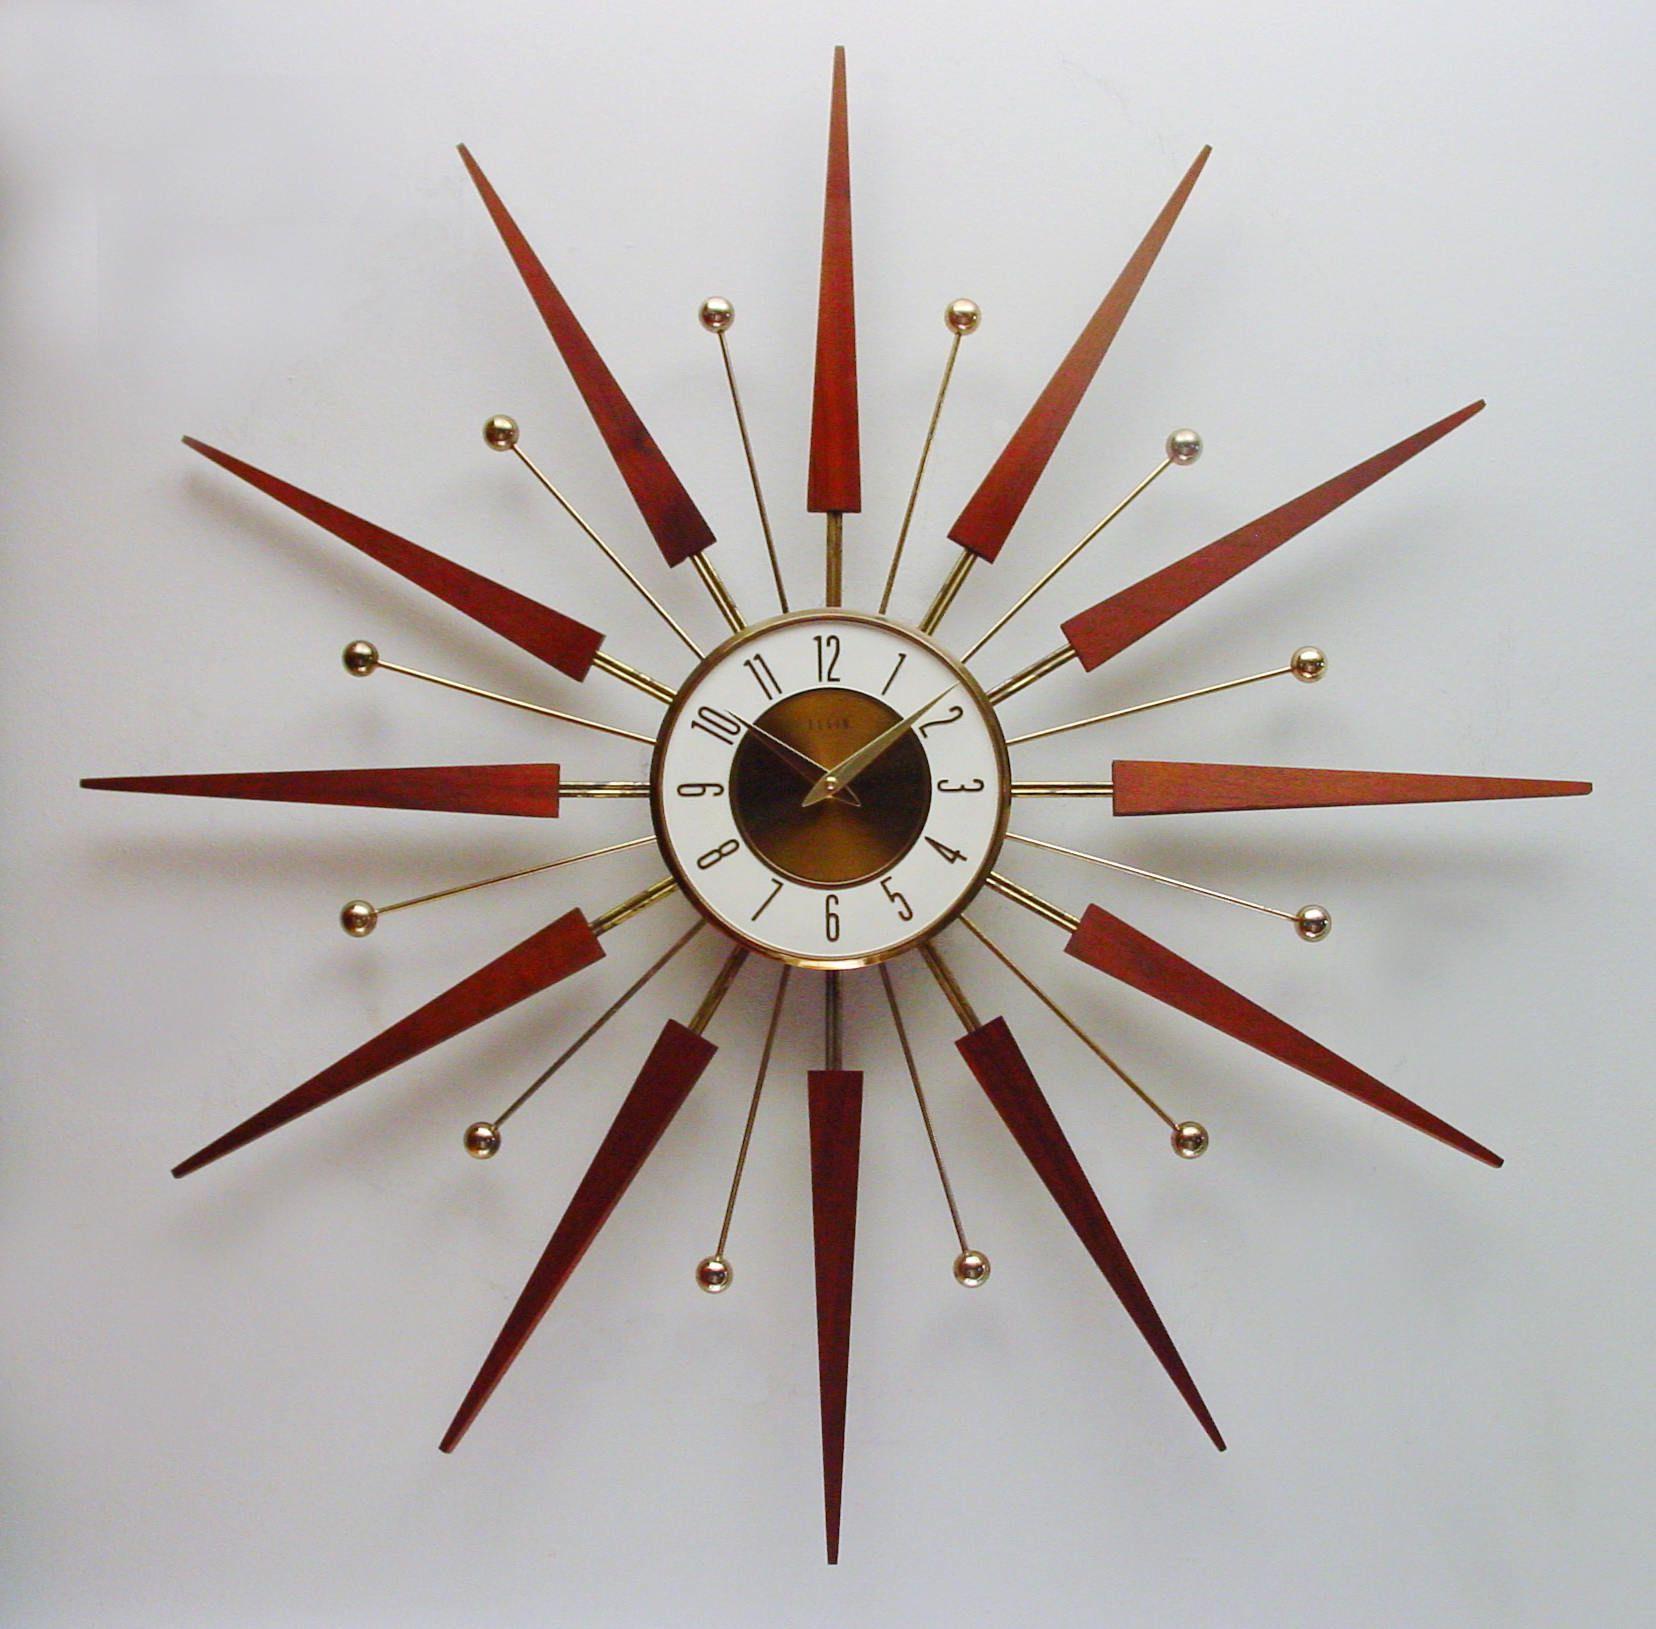 Starburst Clock By Elgin Mid Century Sunburst Wall Clock 1960s Clock Atomic Era Design Coupon Code 00625 Sunburst Clock Clock Wall Clock